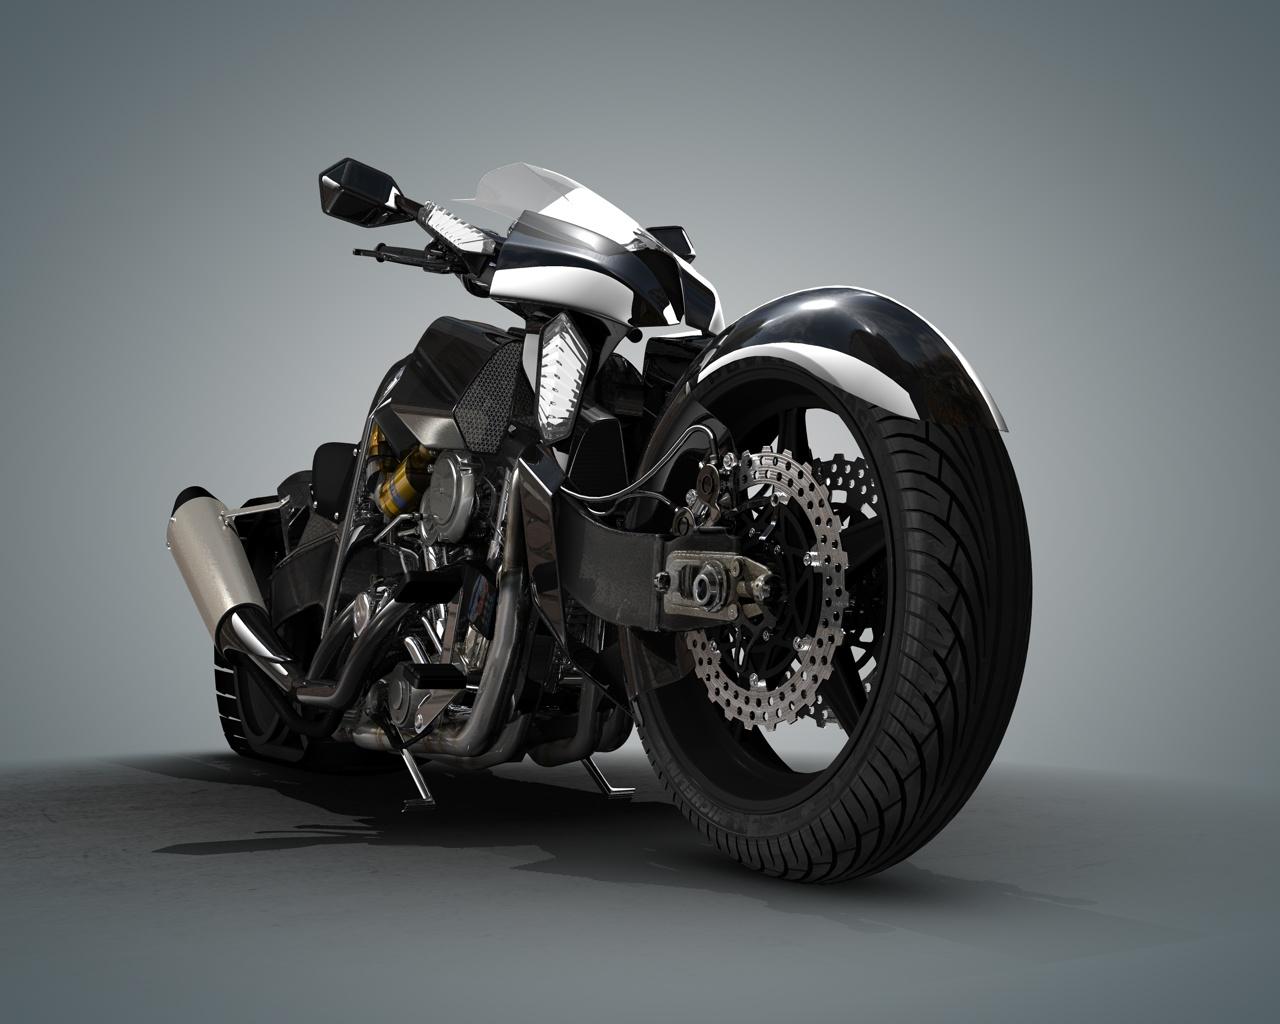 Мотоцикл Yamaha VMX V-Max 17 2011 Цена, Фото